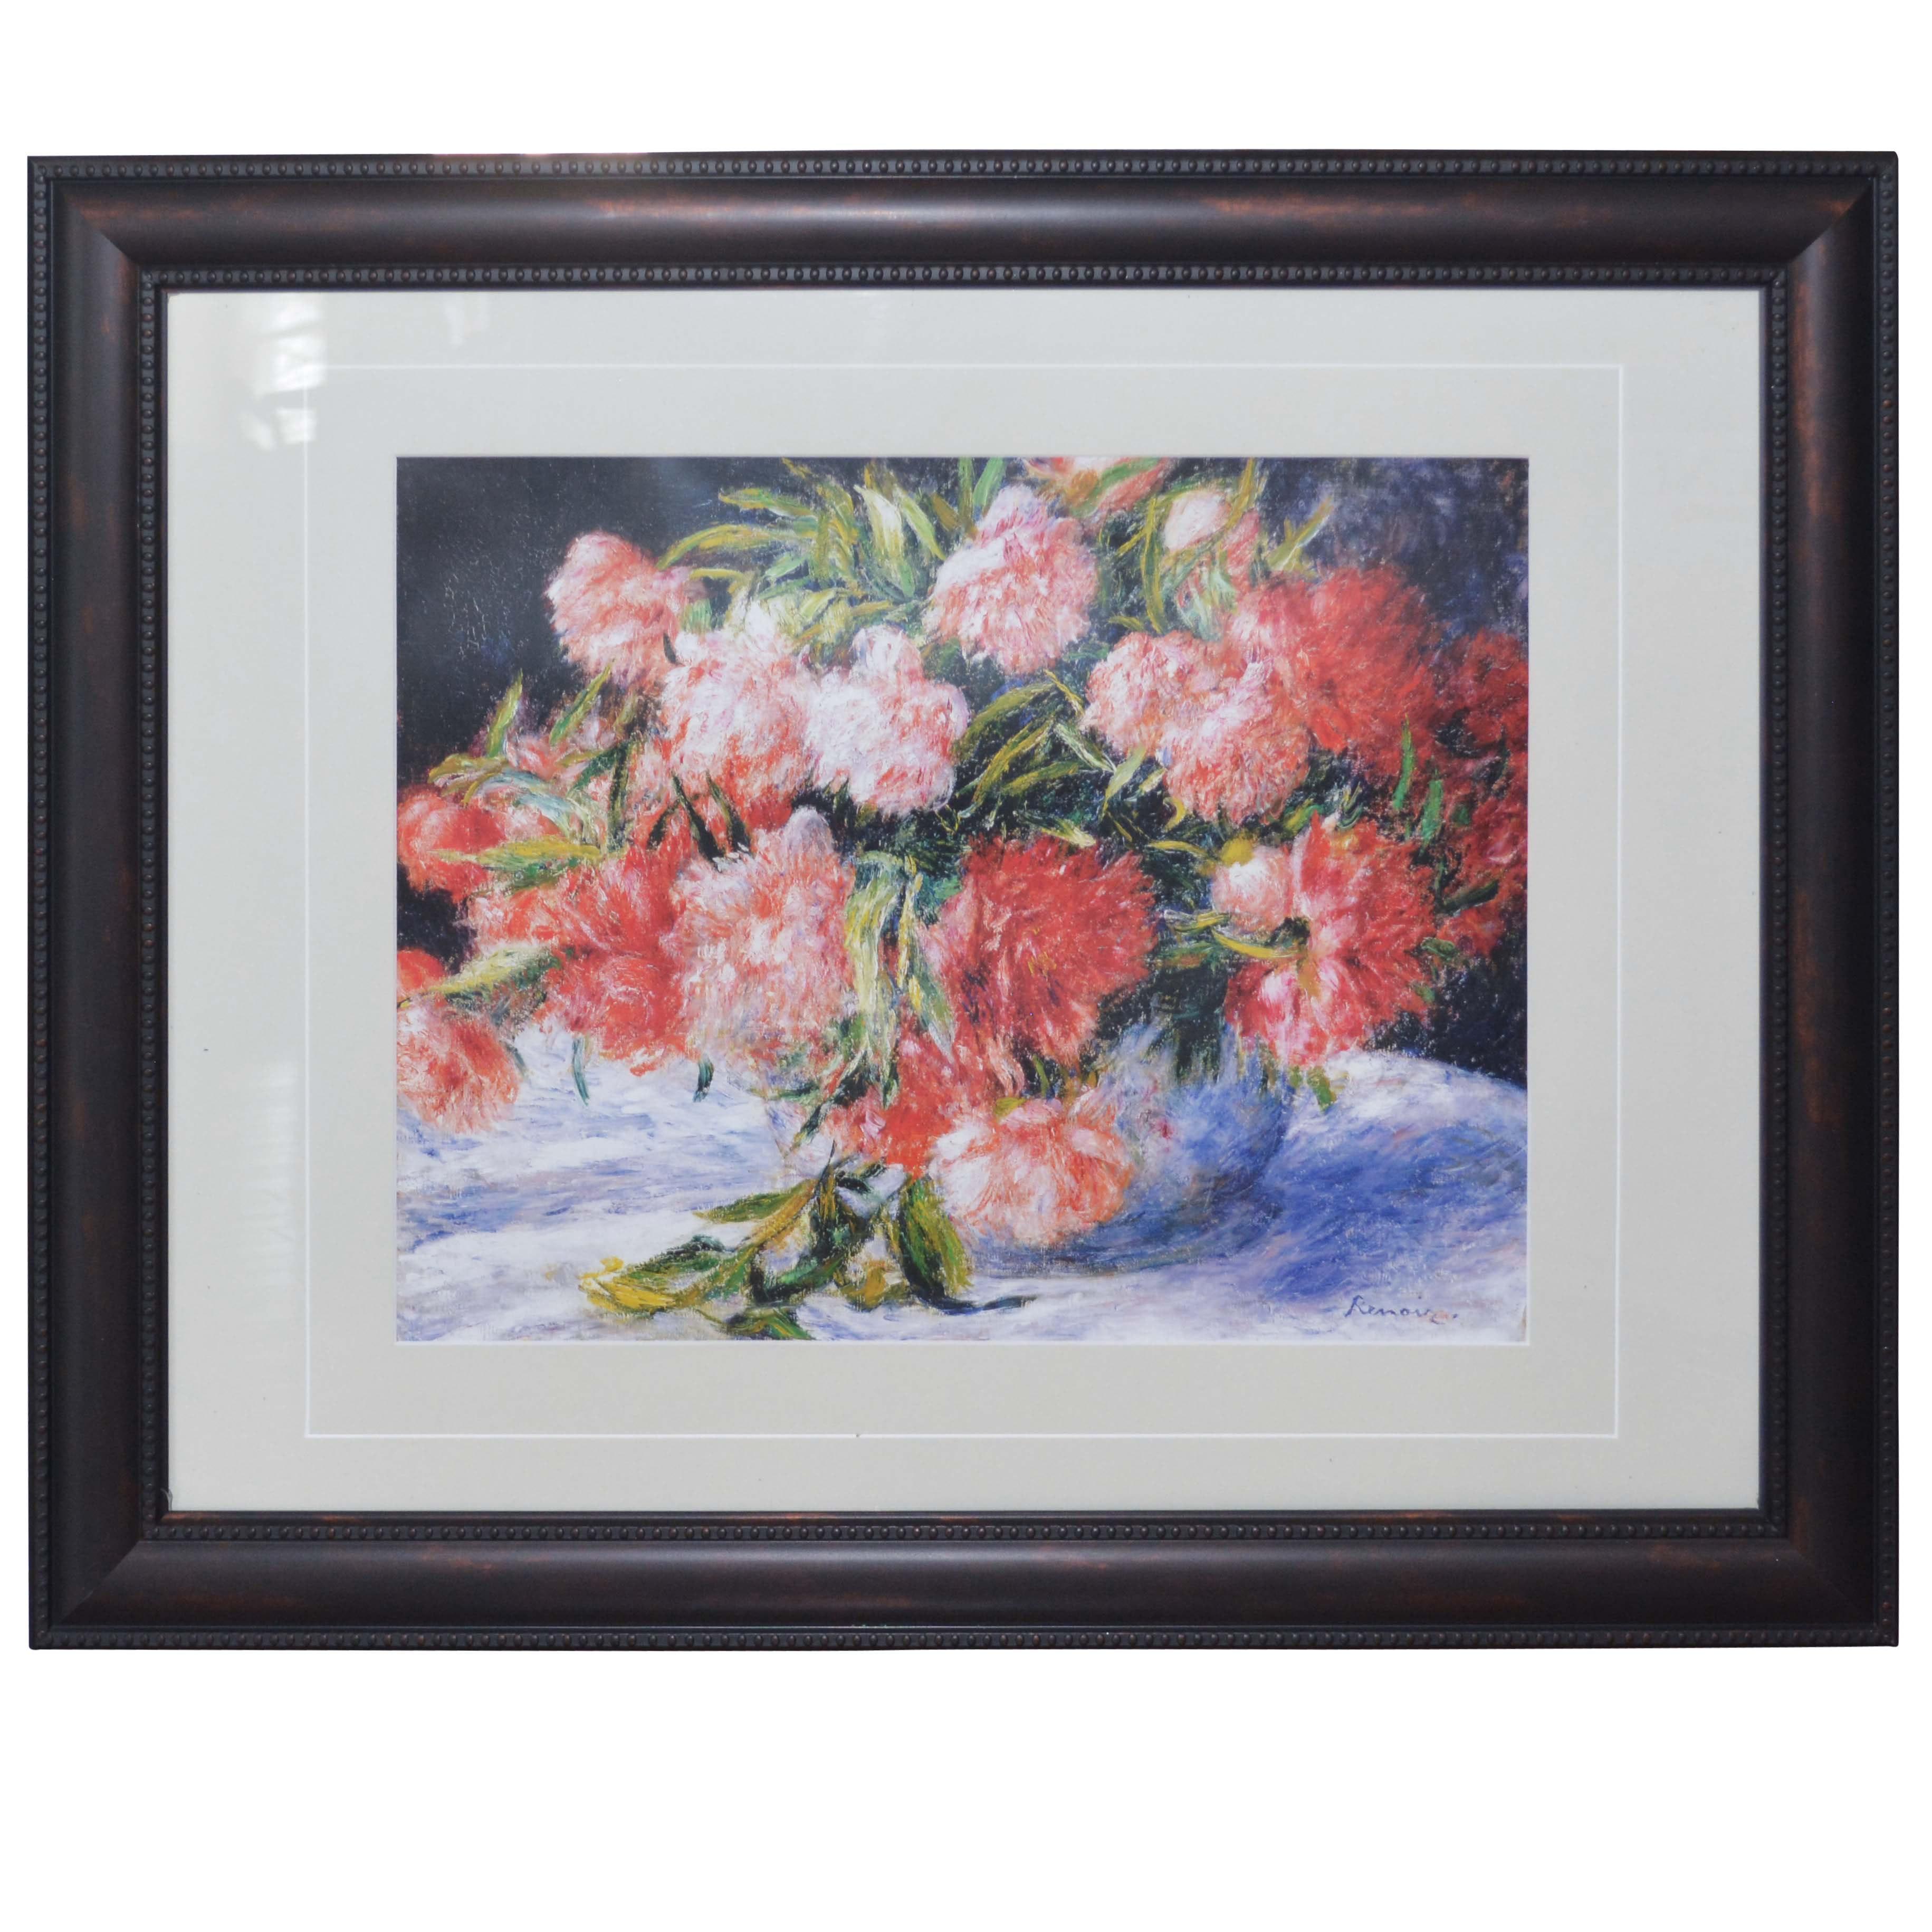 "Reproduction Print After Pierre-Auguste Renoir ""Peonies"""